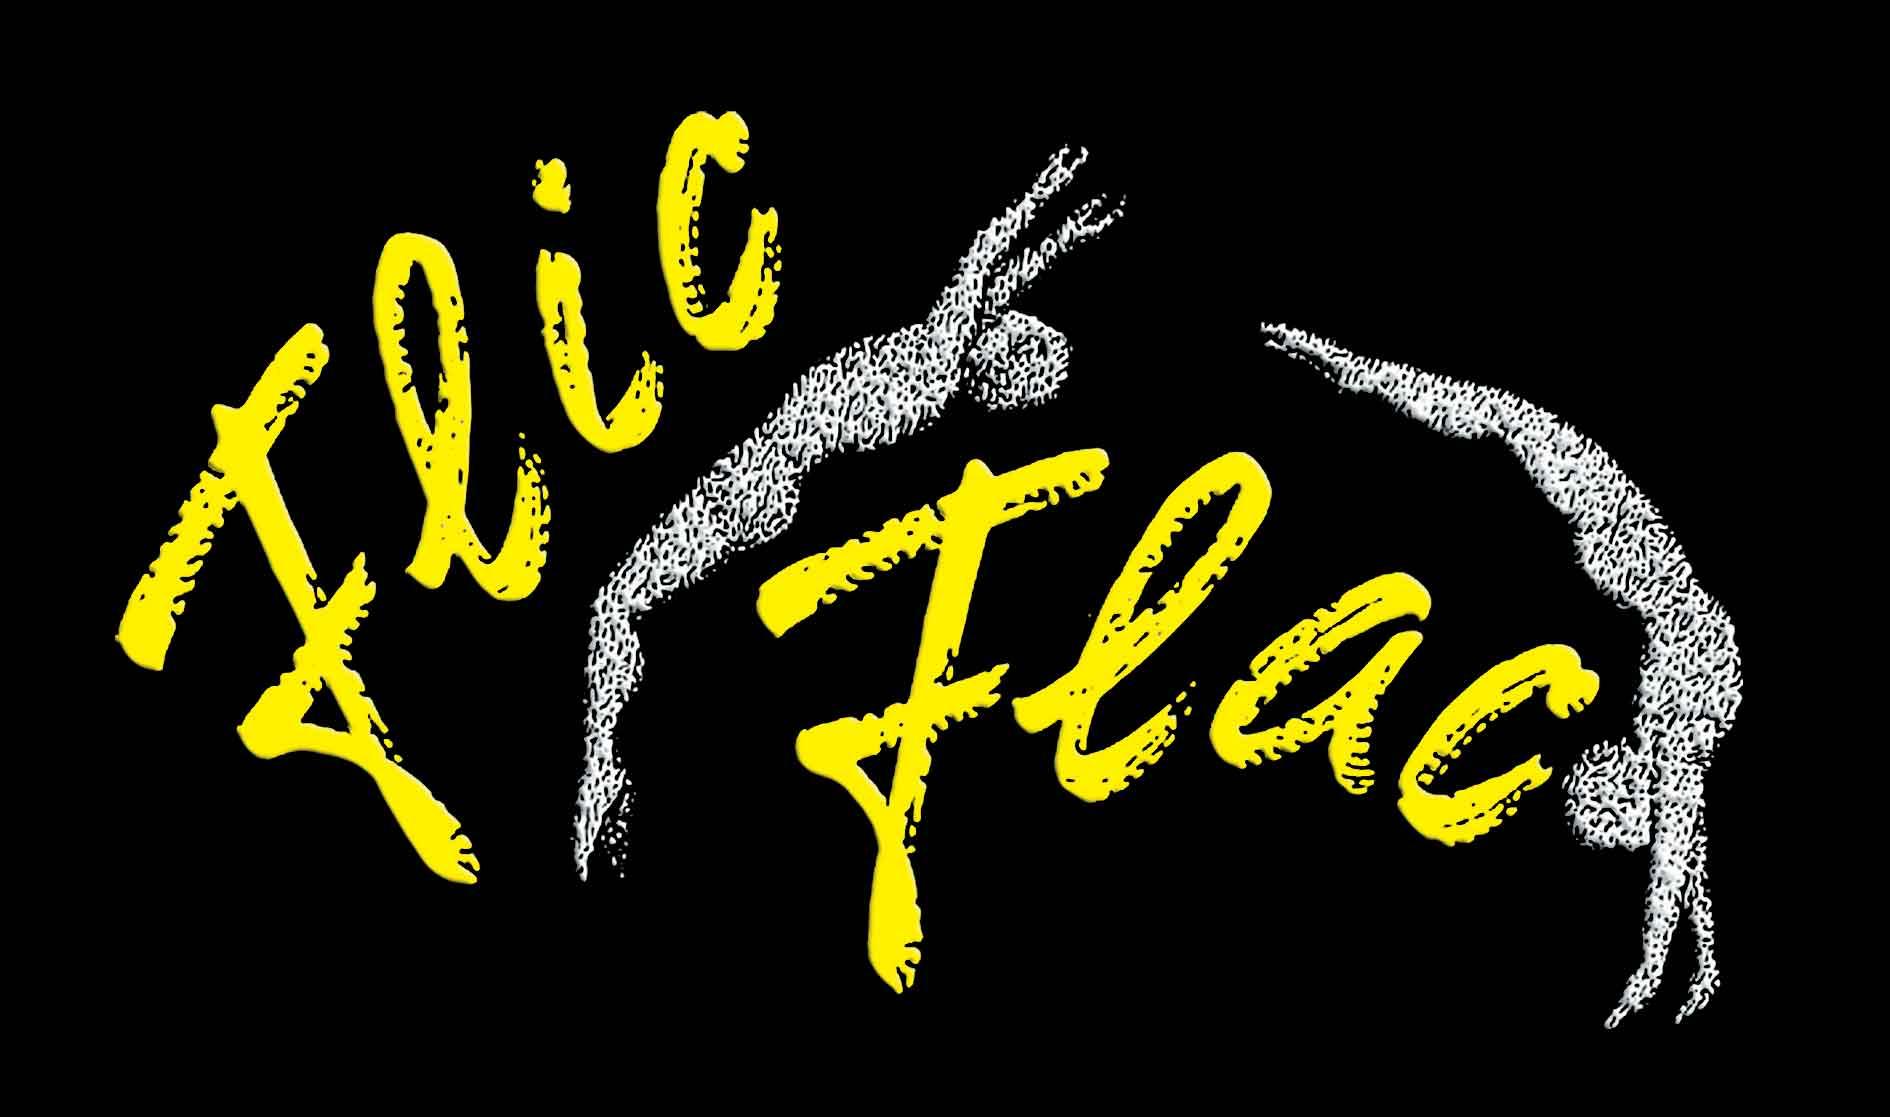 Alle Infos zum Zirkus Flic Flac in Köln